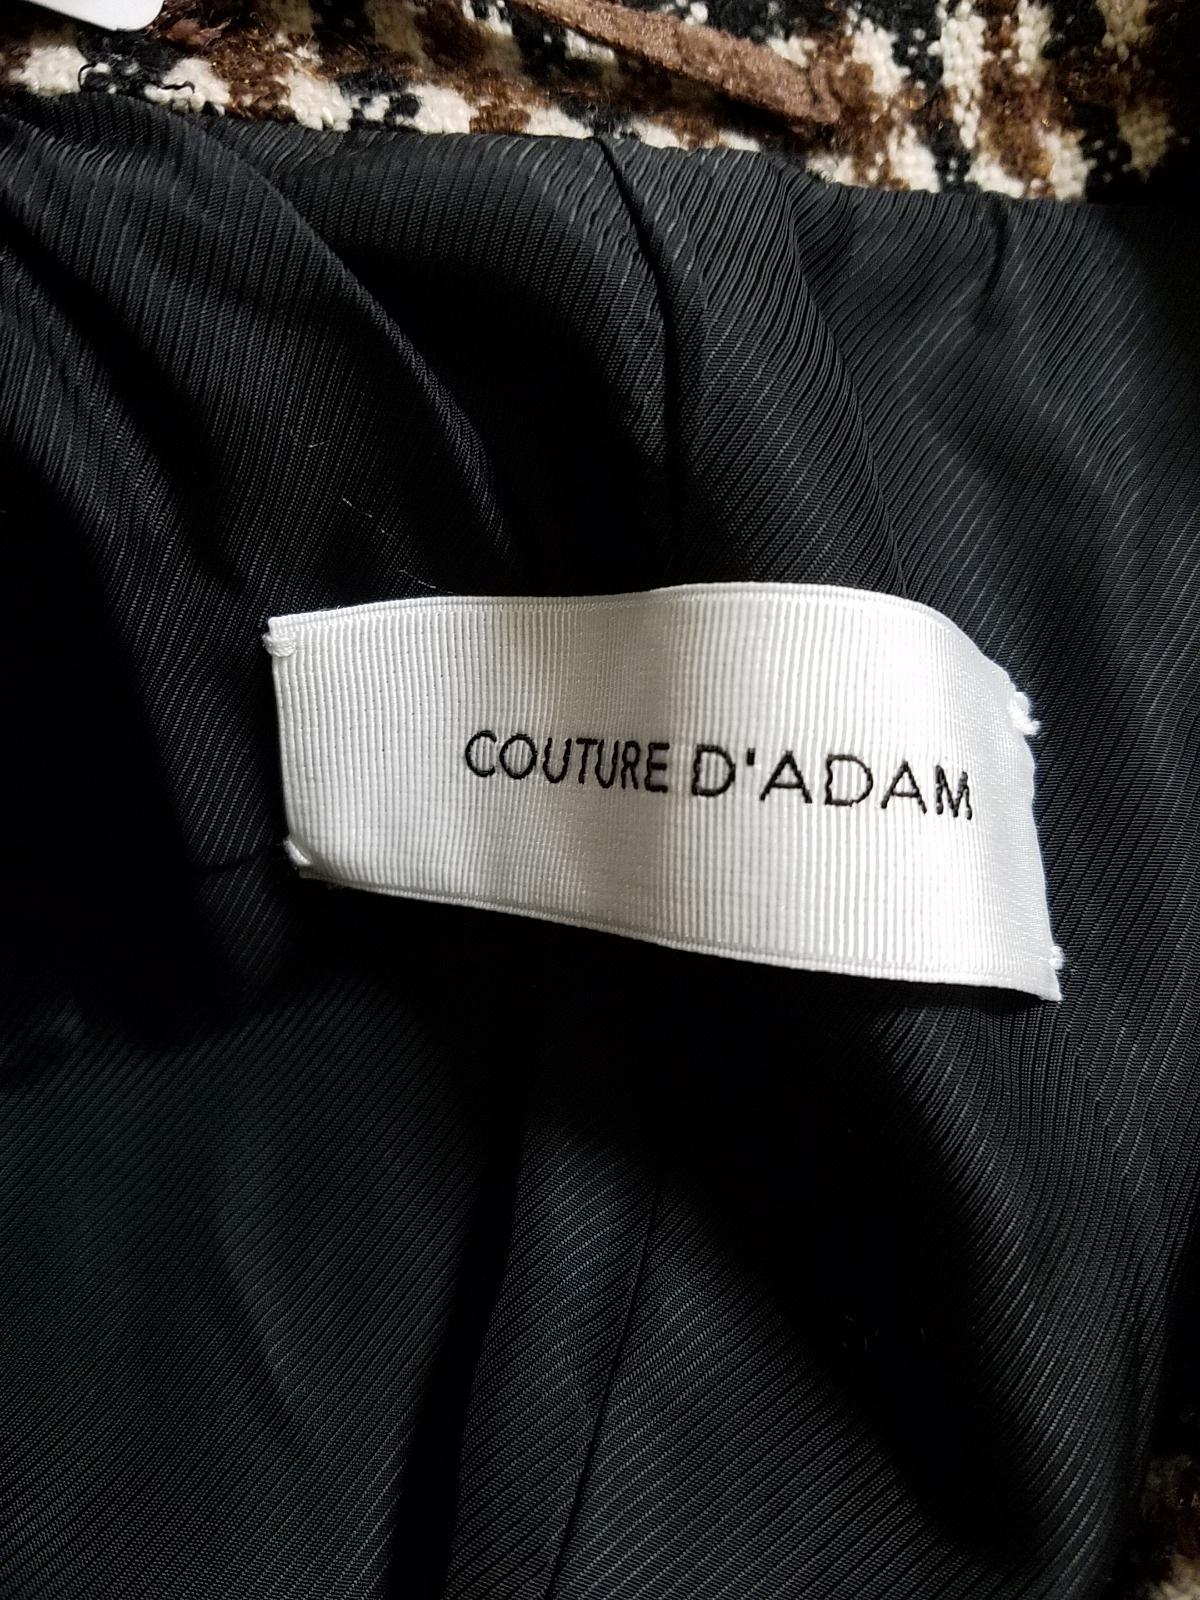 Couture d'Adam(クチュールドアダム)のコート